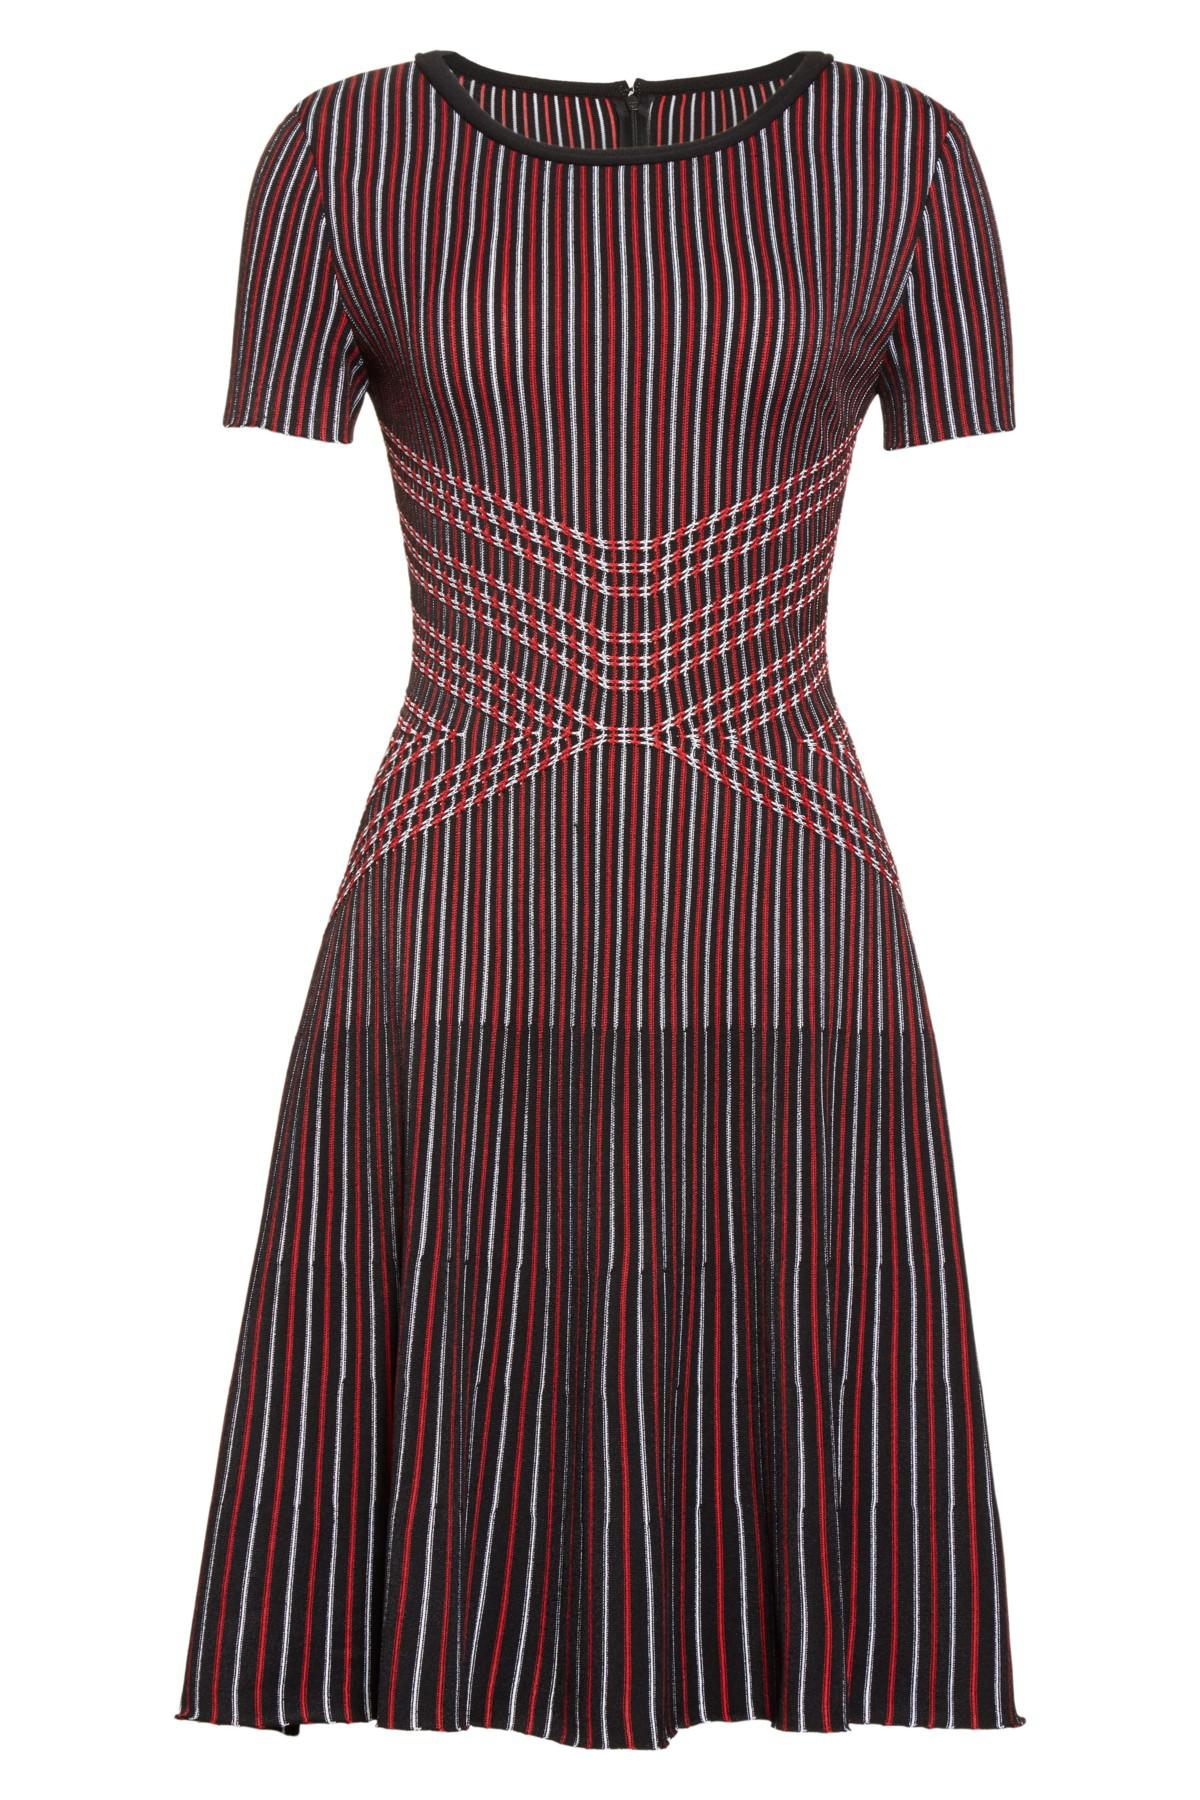 St John Synthetic Atlantis Knit Fit Amp Flare Dress